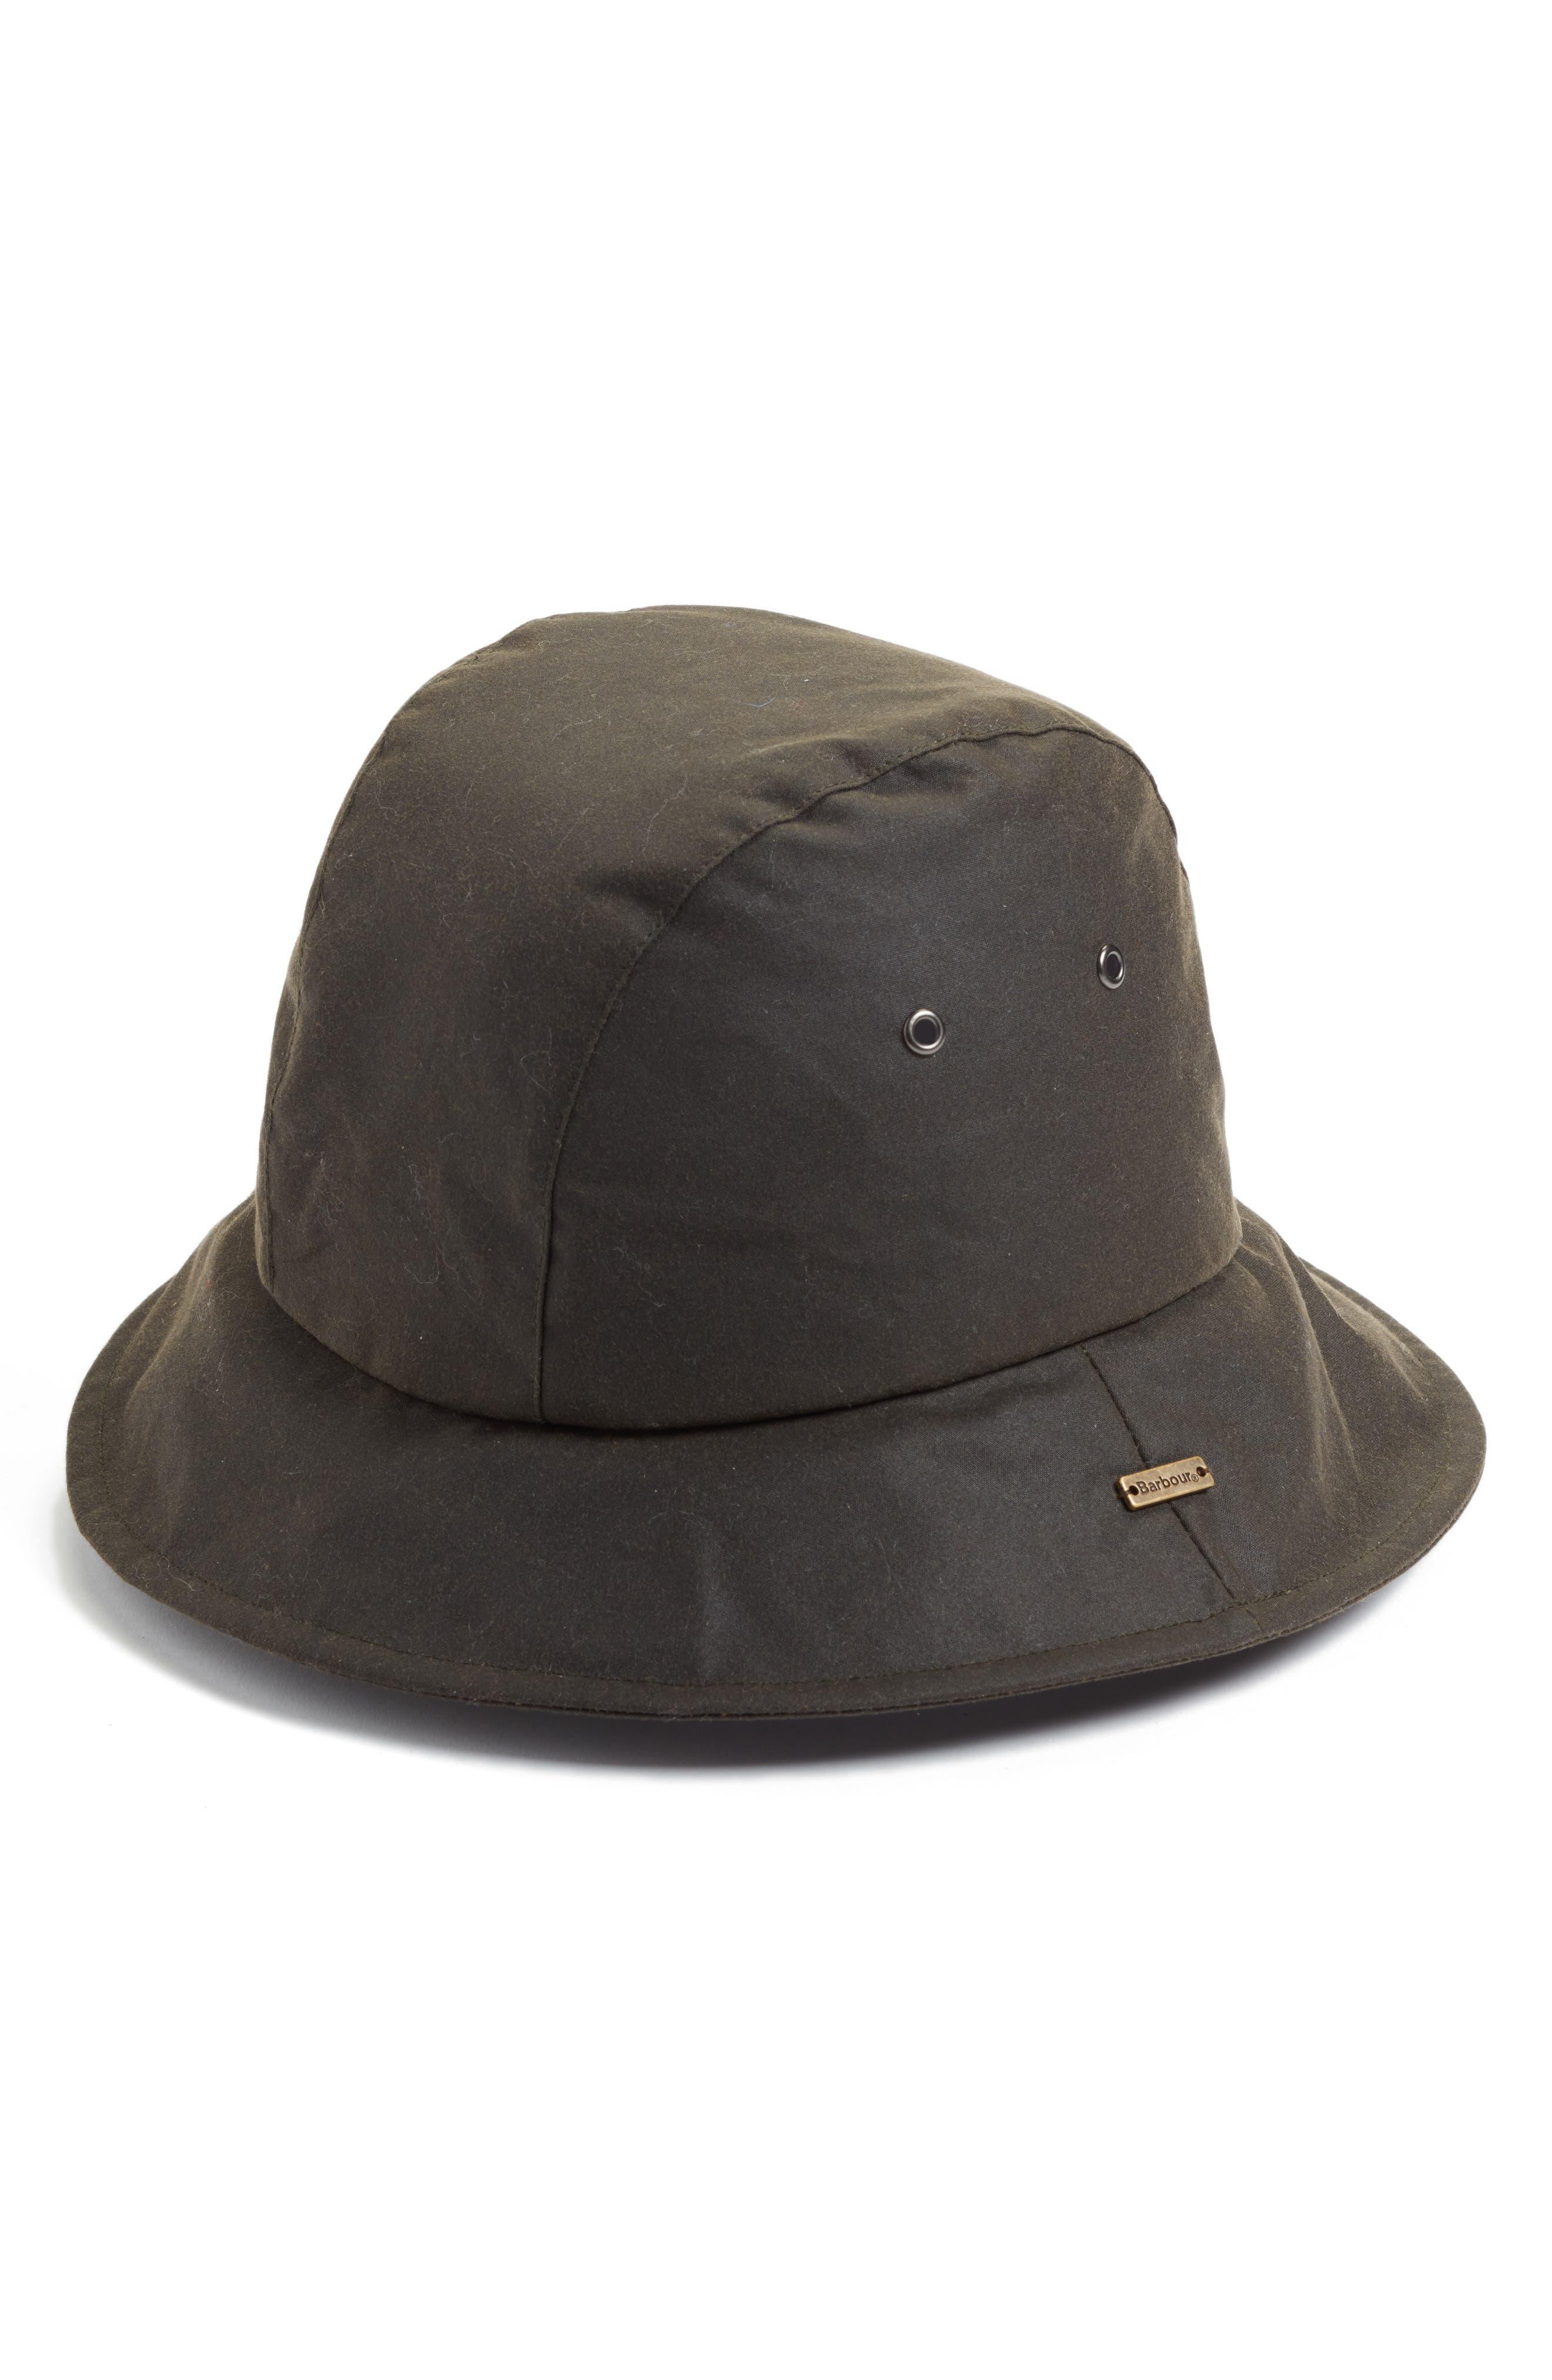 BARBOUR Barbou Sou Wester Bucket Hat, Main, color, 340